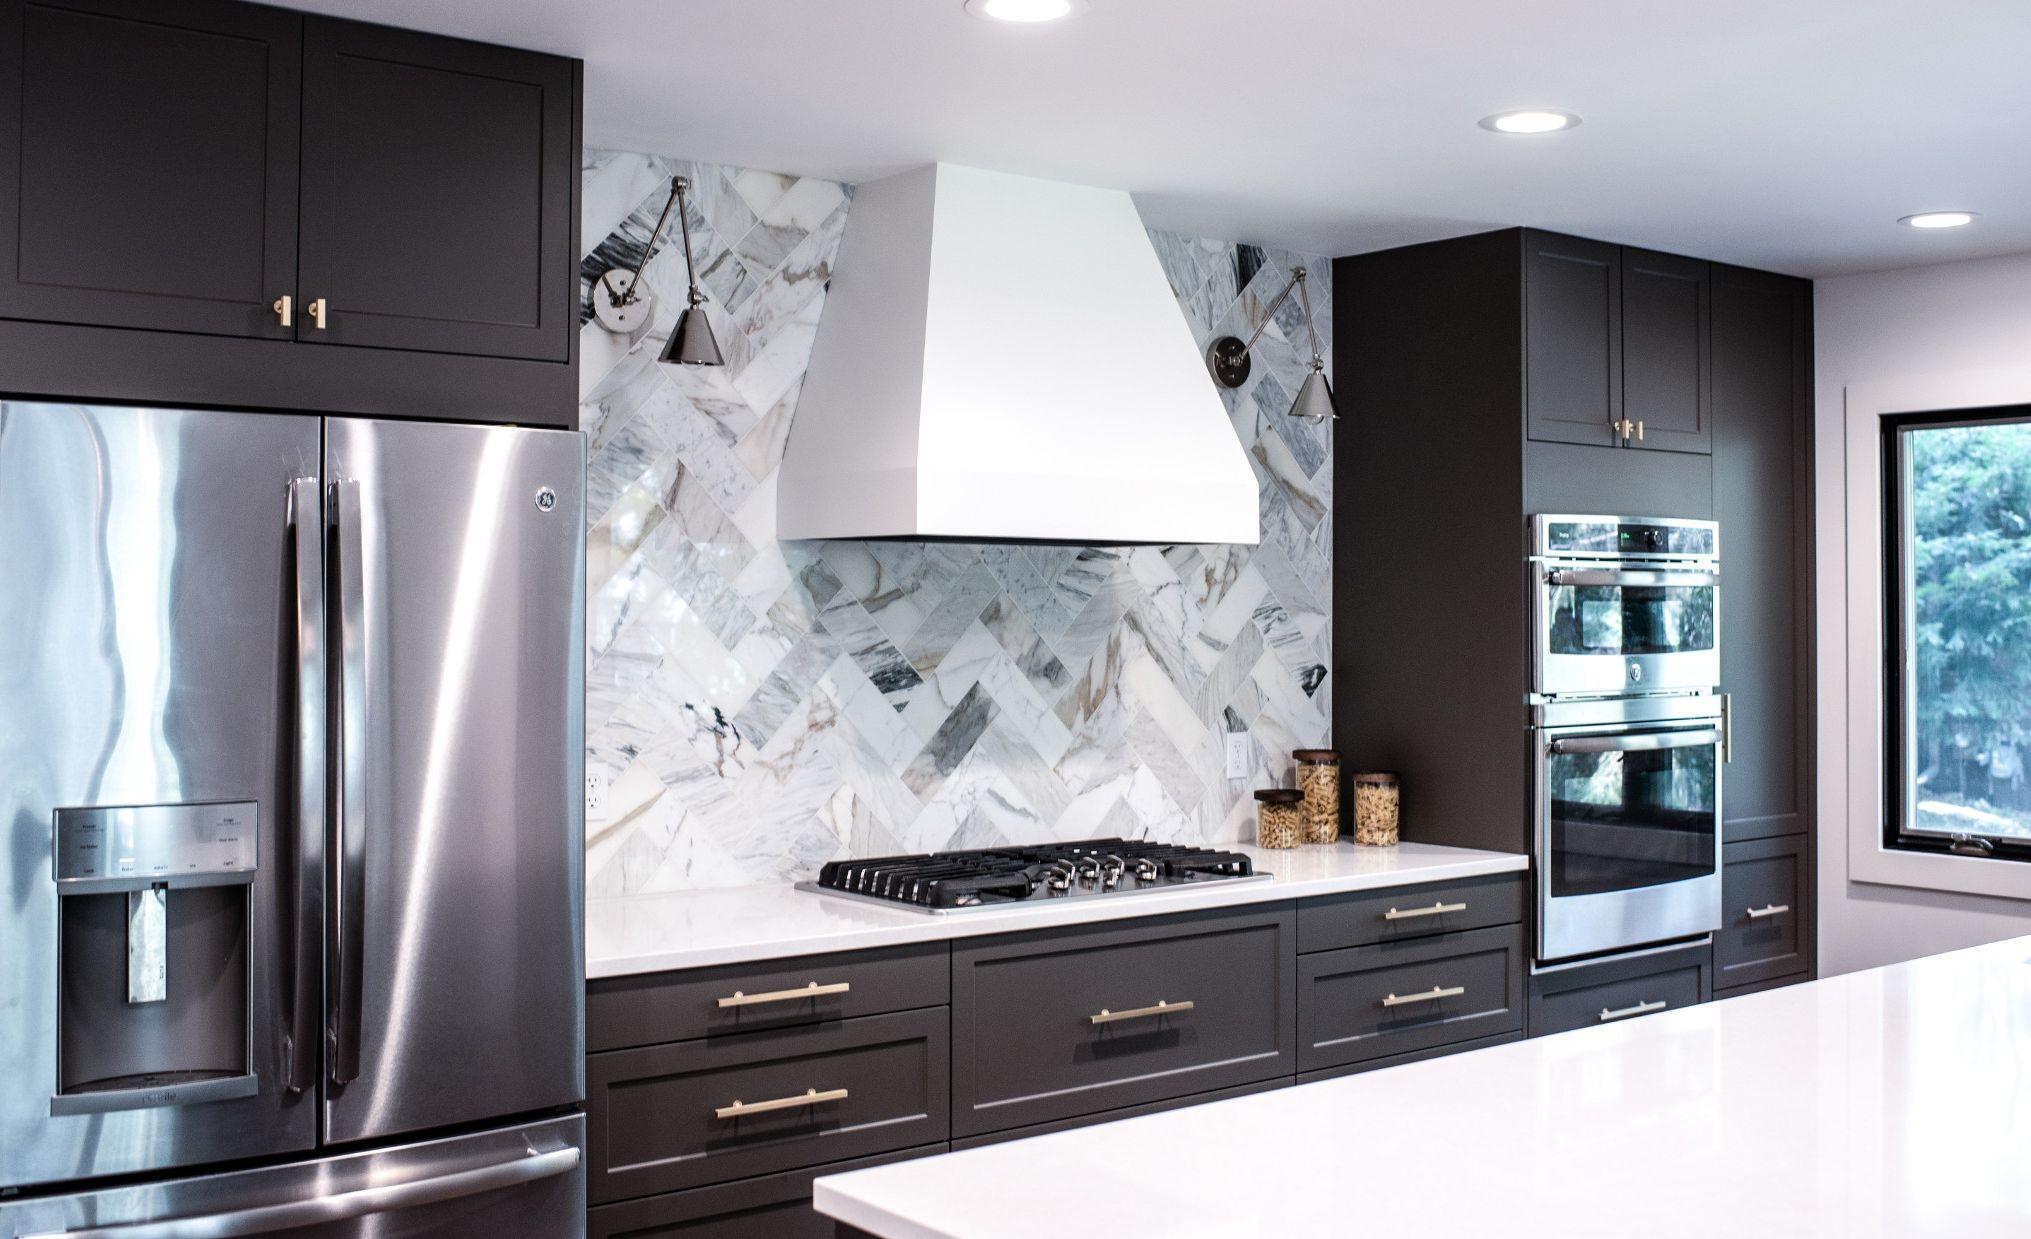 Stunning herringbone backsplash combine with Cambria Newport and gray cabinets.